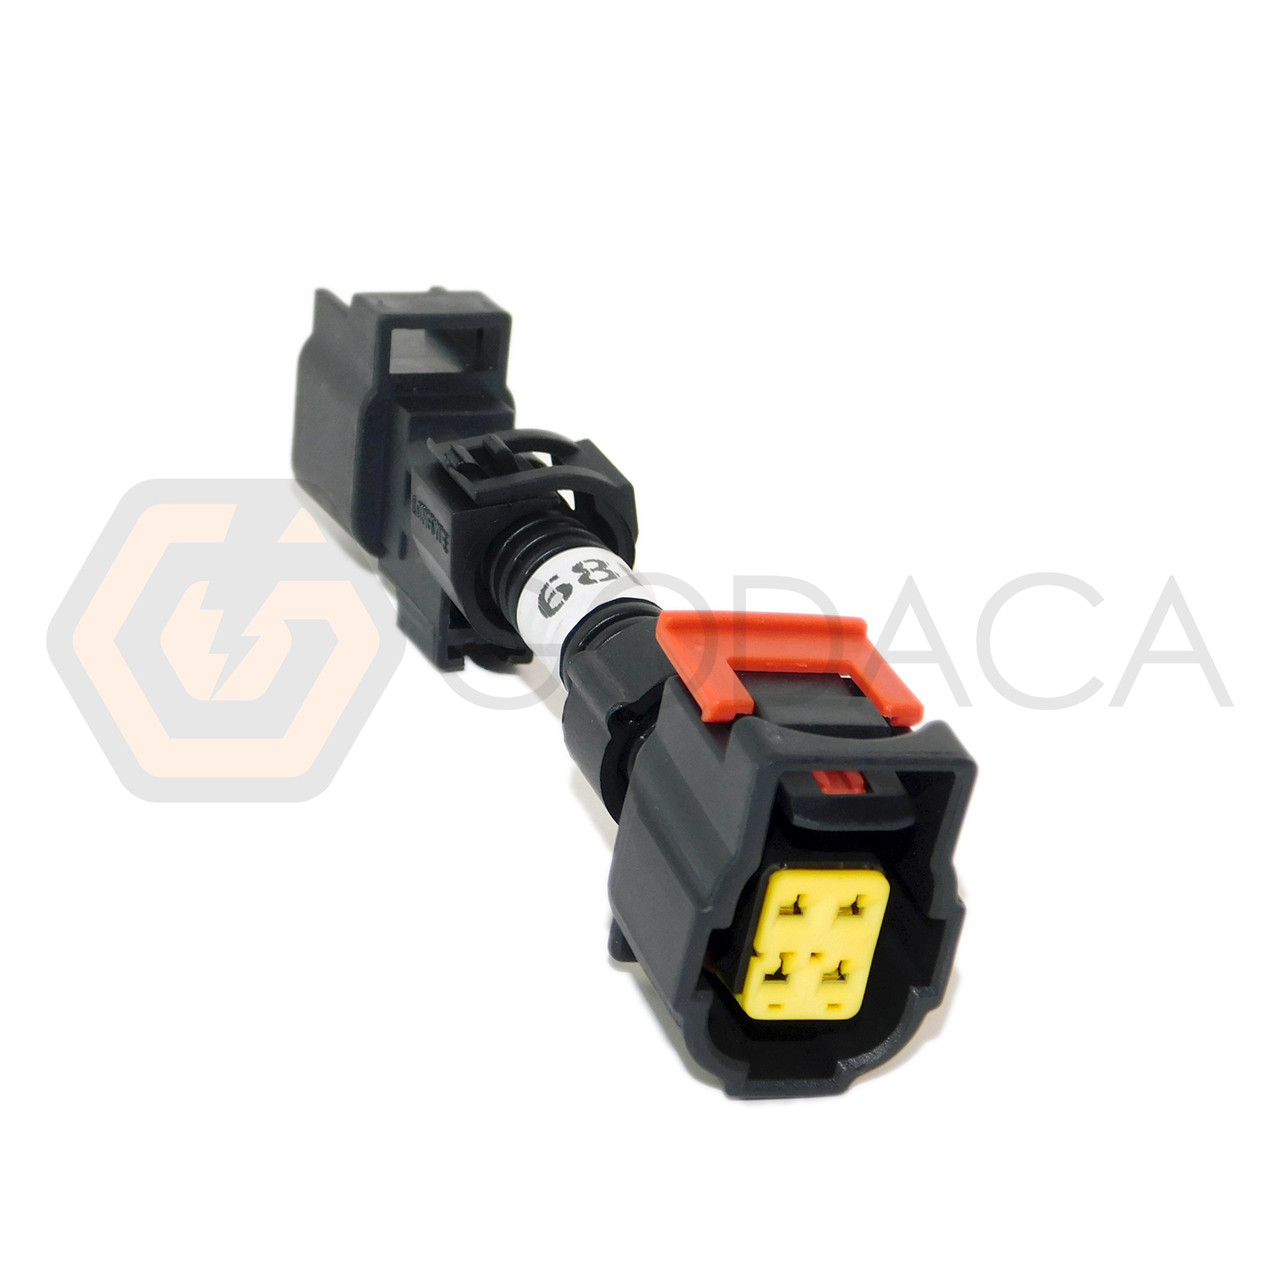 hight resolution of 1x wiring harness for dodge chrysler transmission line pressure booster 68rfe godaca llc